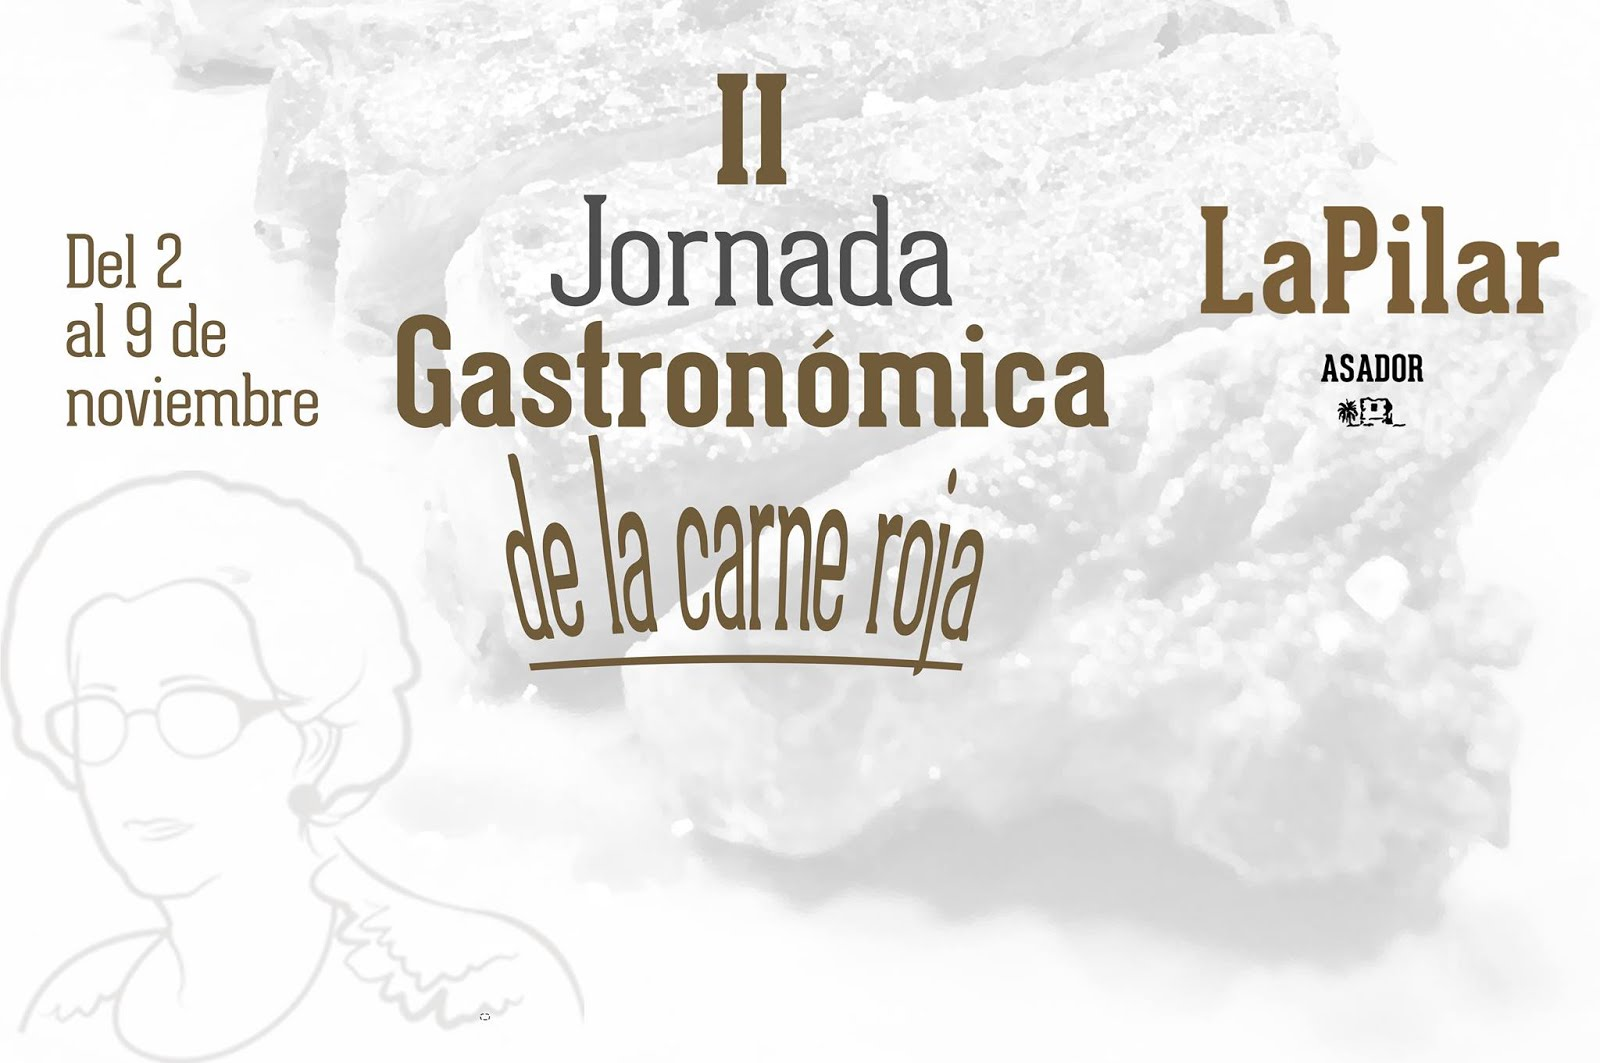 II Jornada Gastronómica de la carne roja en Asador La Pilar.